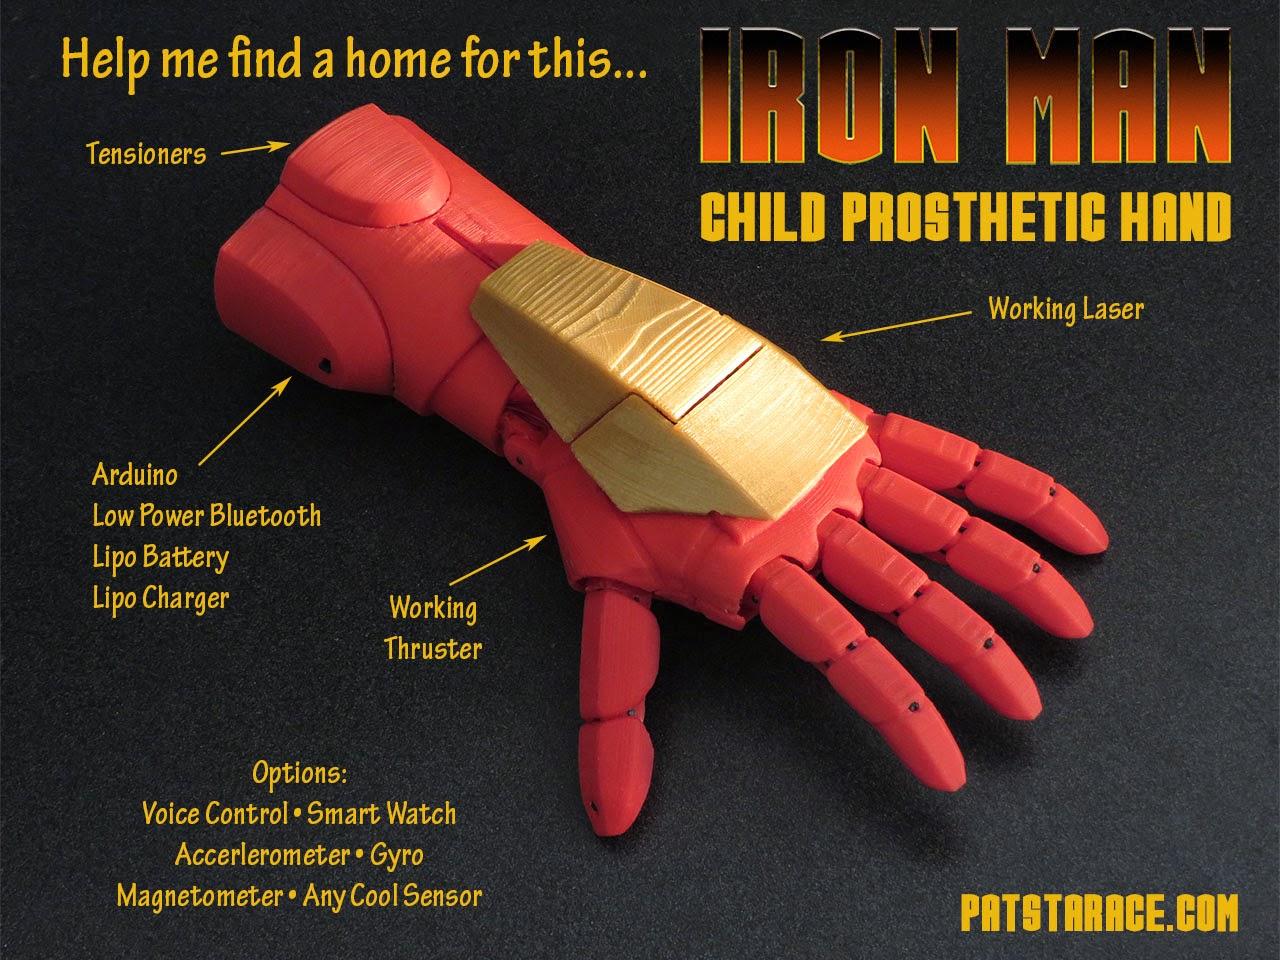 iron man child prosthetic hand